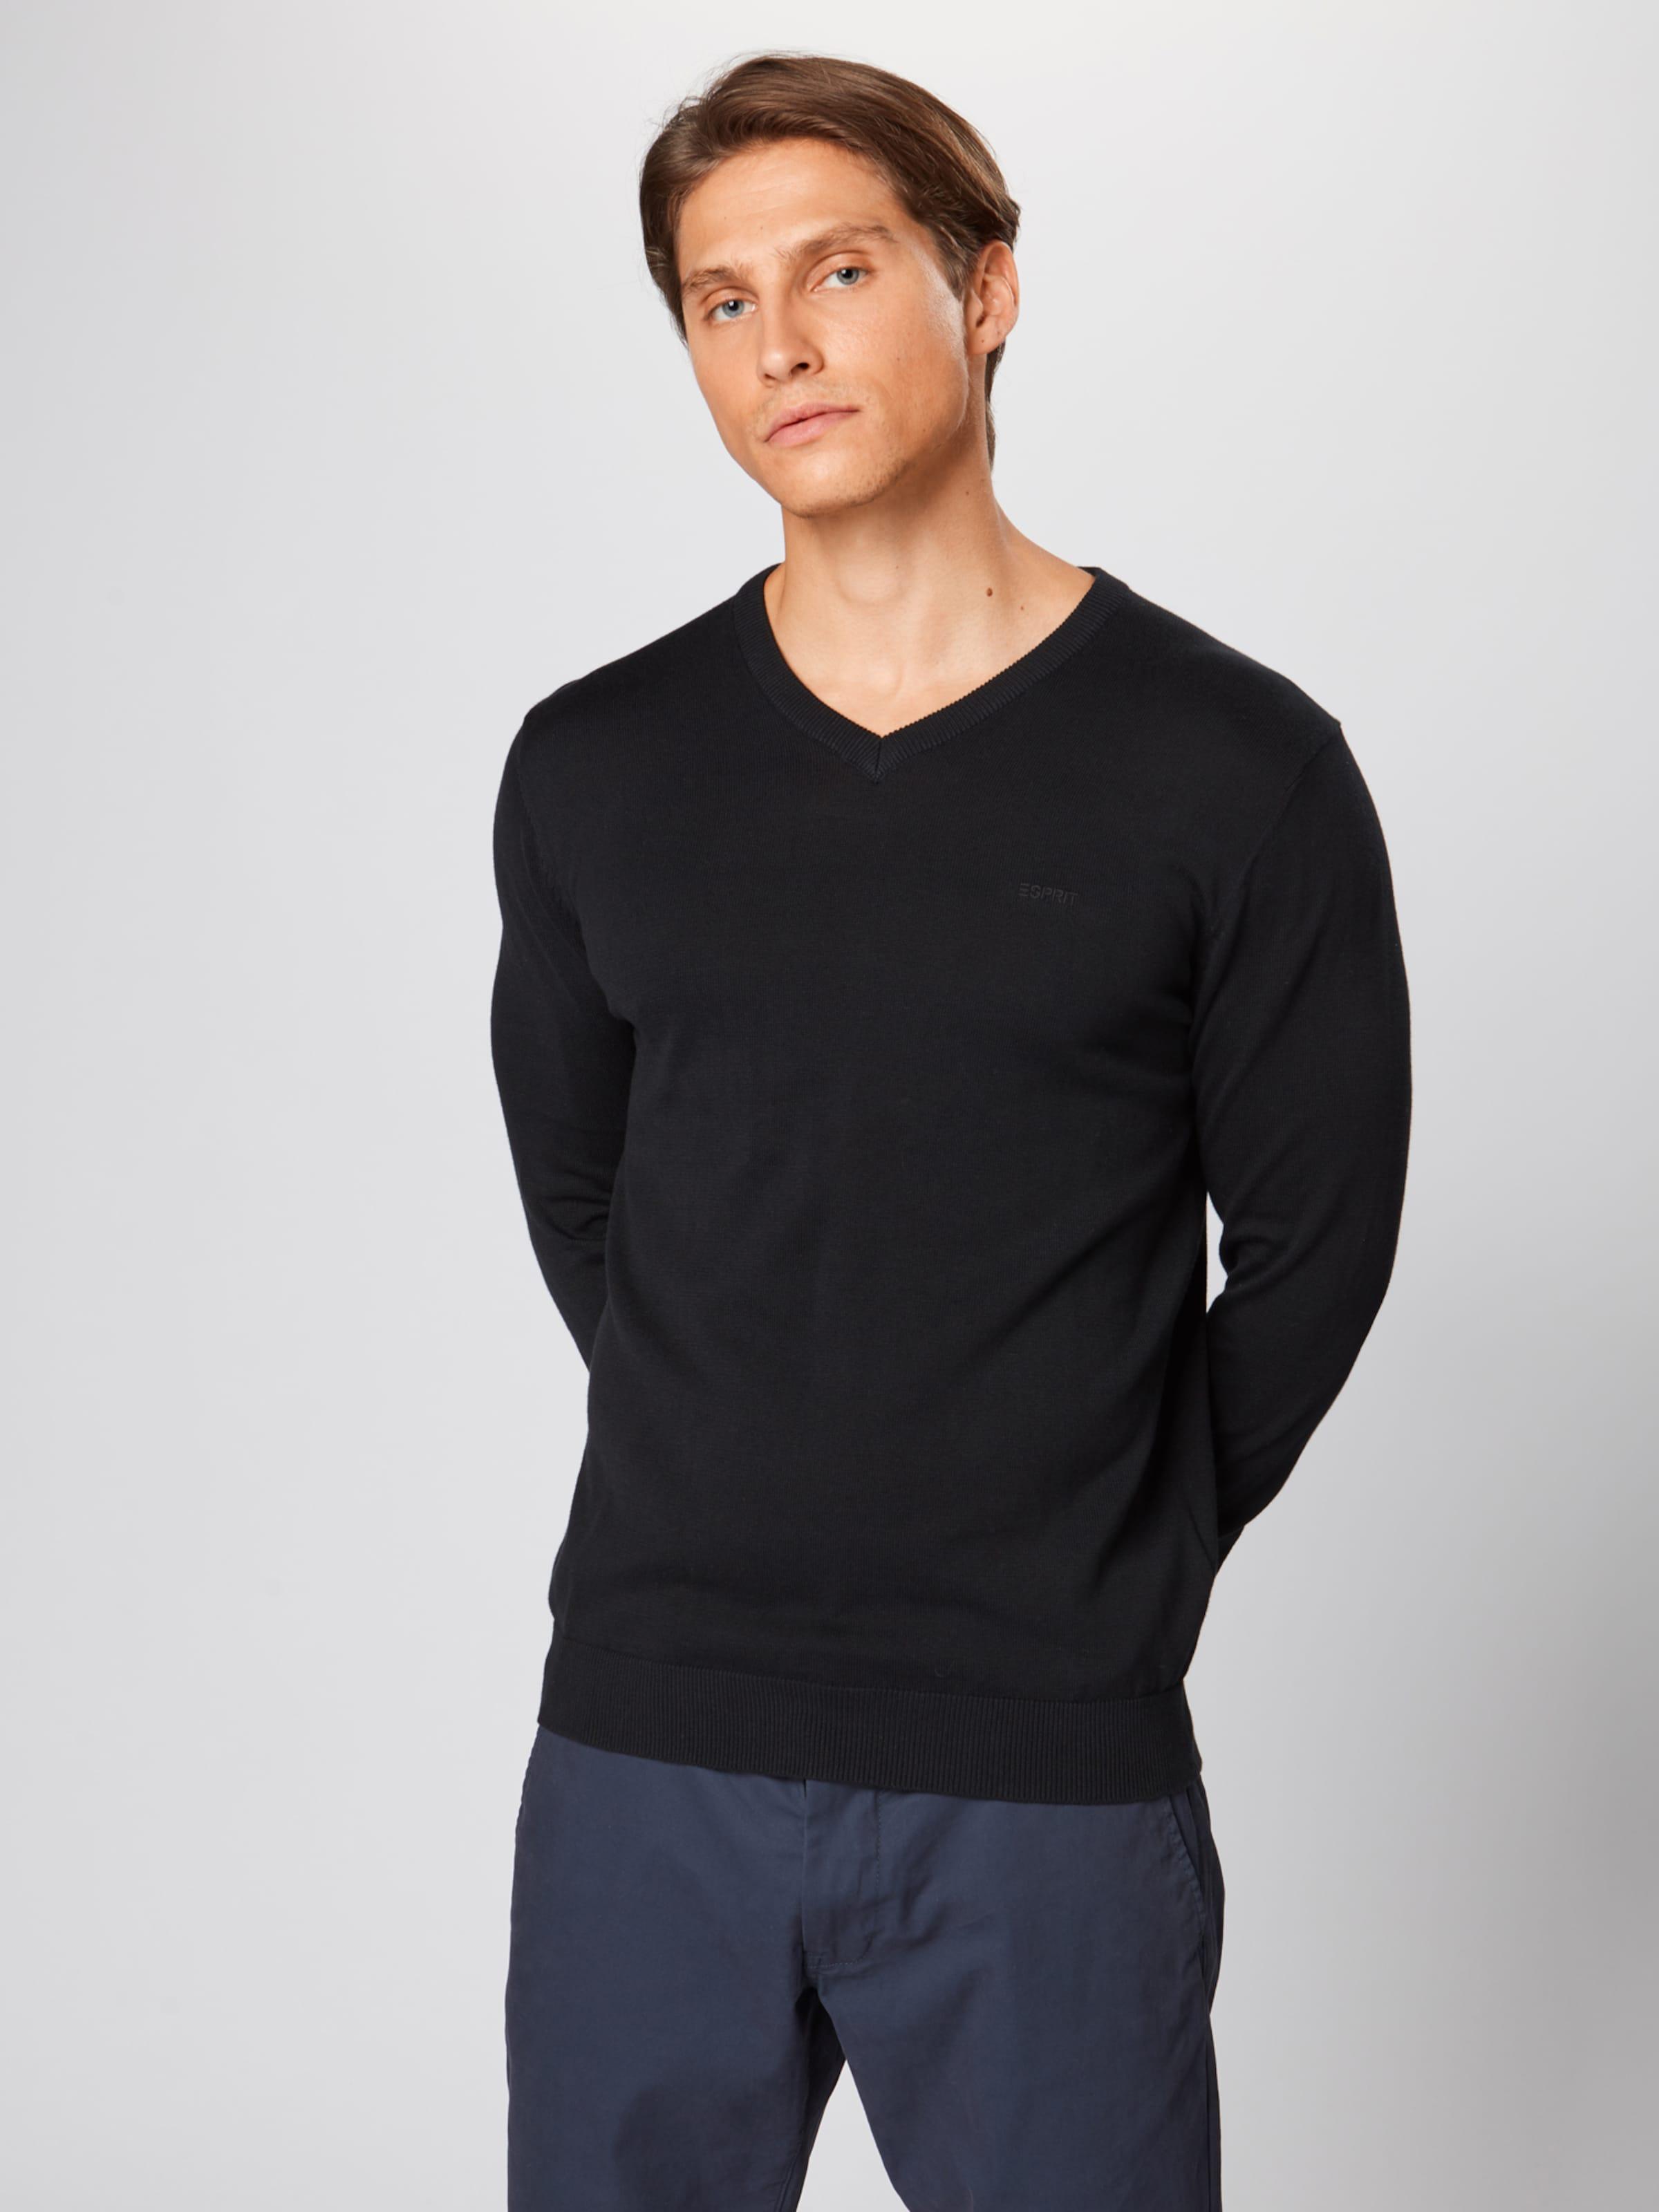 Esprit Co nk' In Pullover 'ocs V Schwarz tsQdhrCx